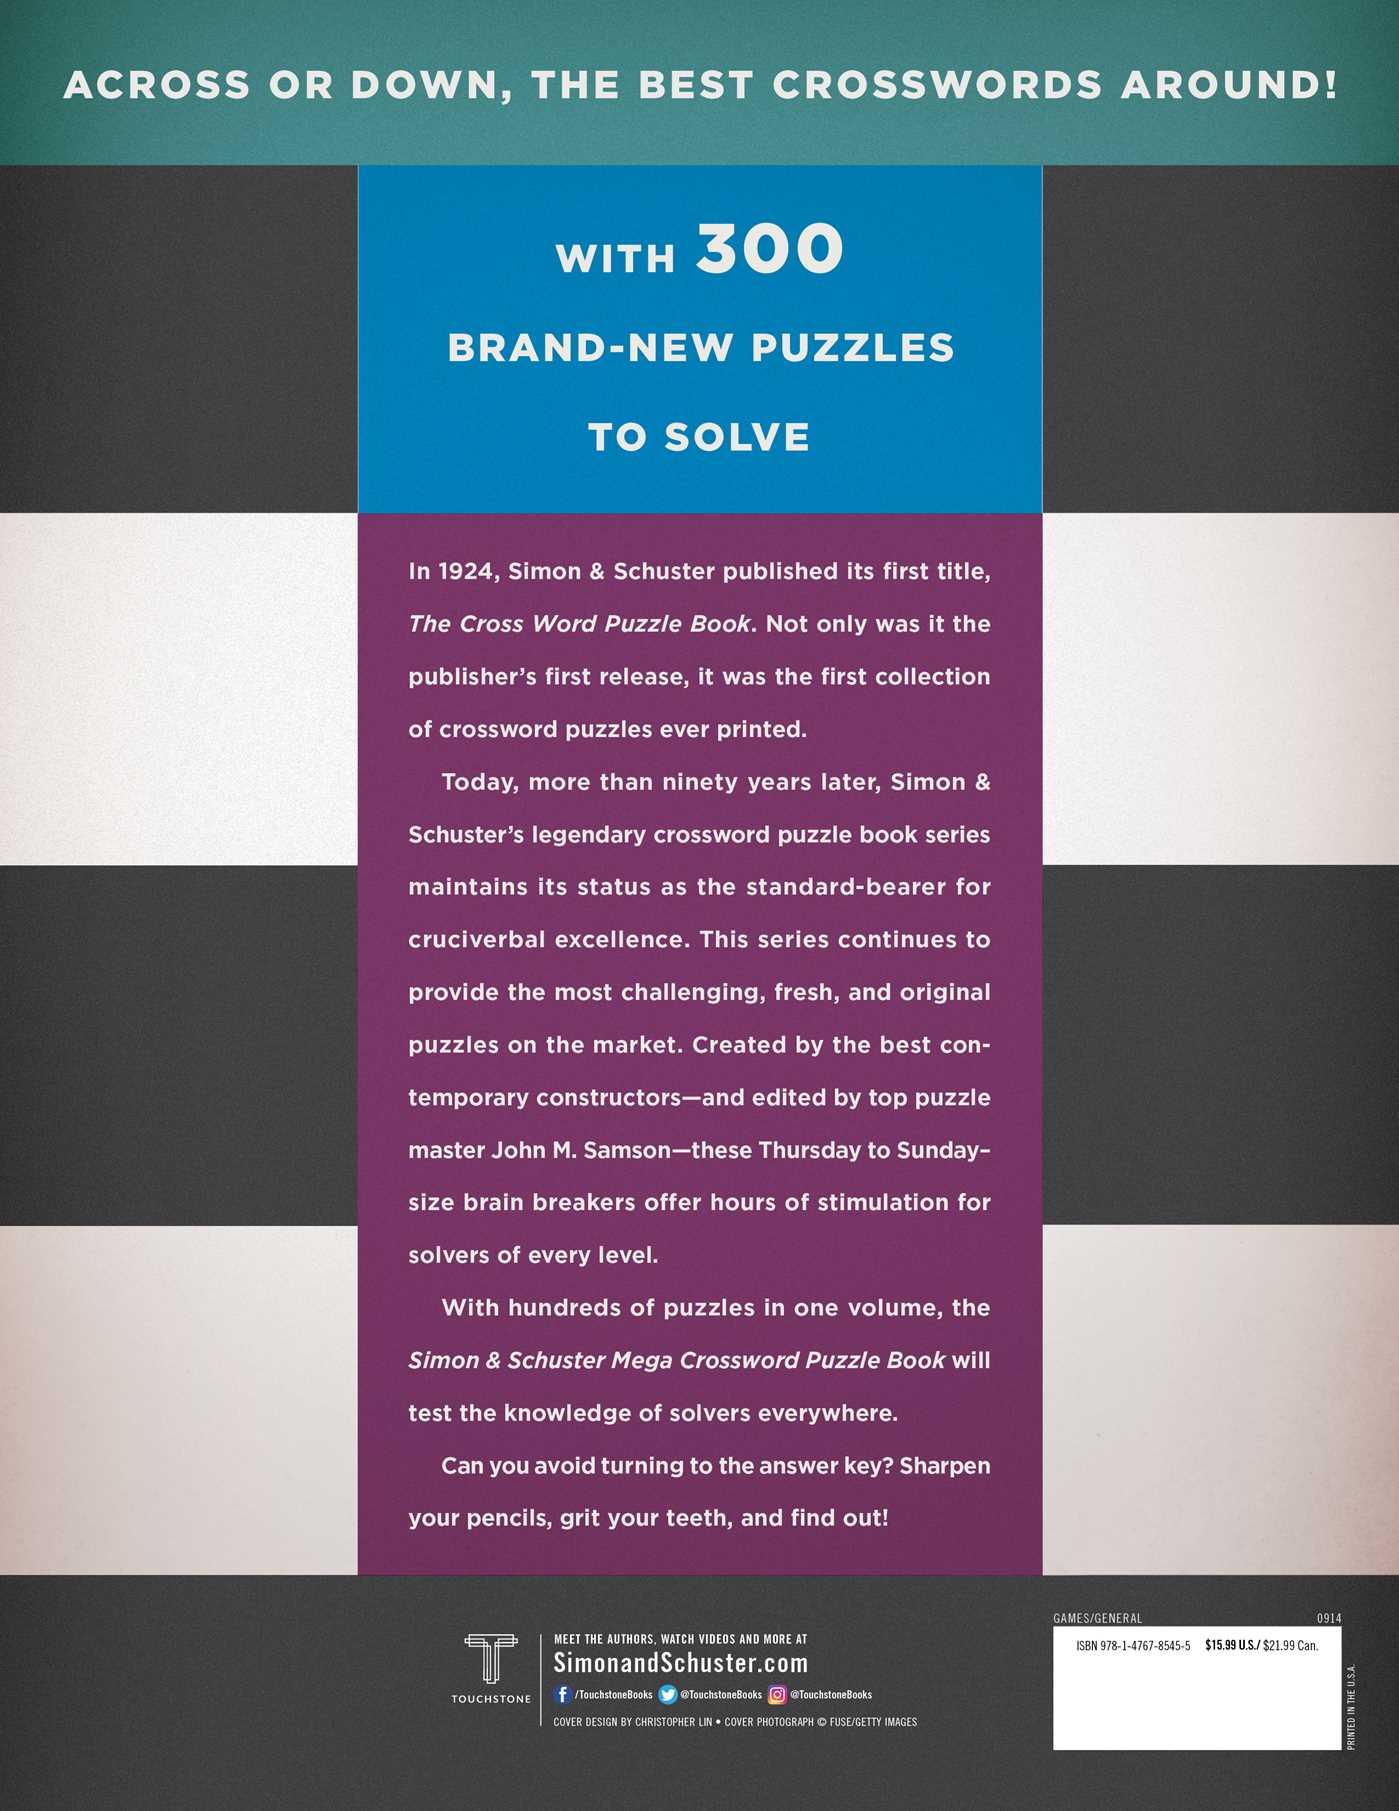 Simon schuster mega crossword puzzle book 14 9781476785455 hr back